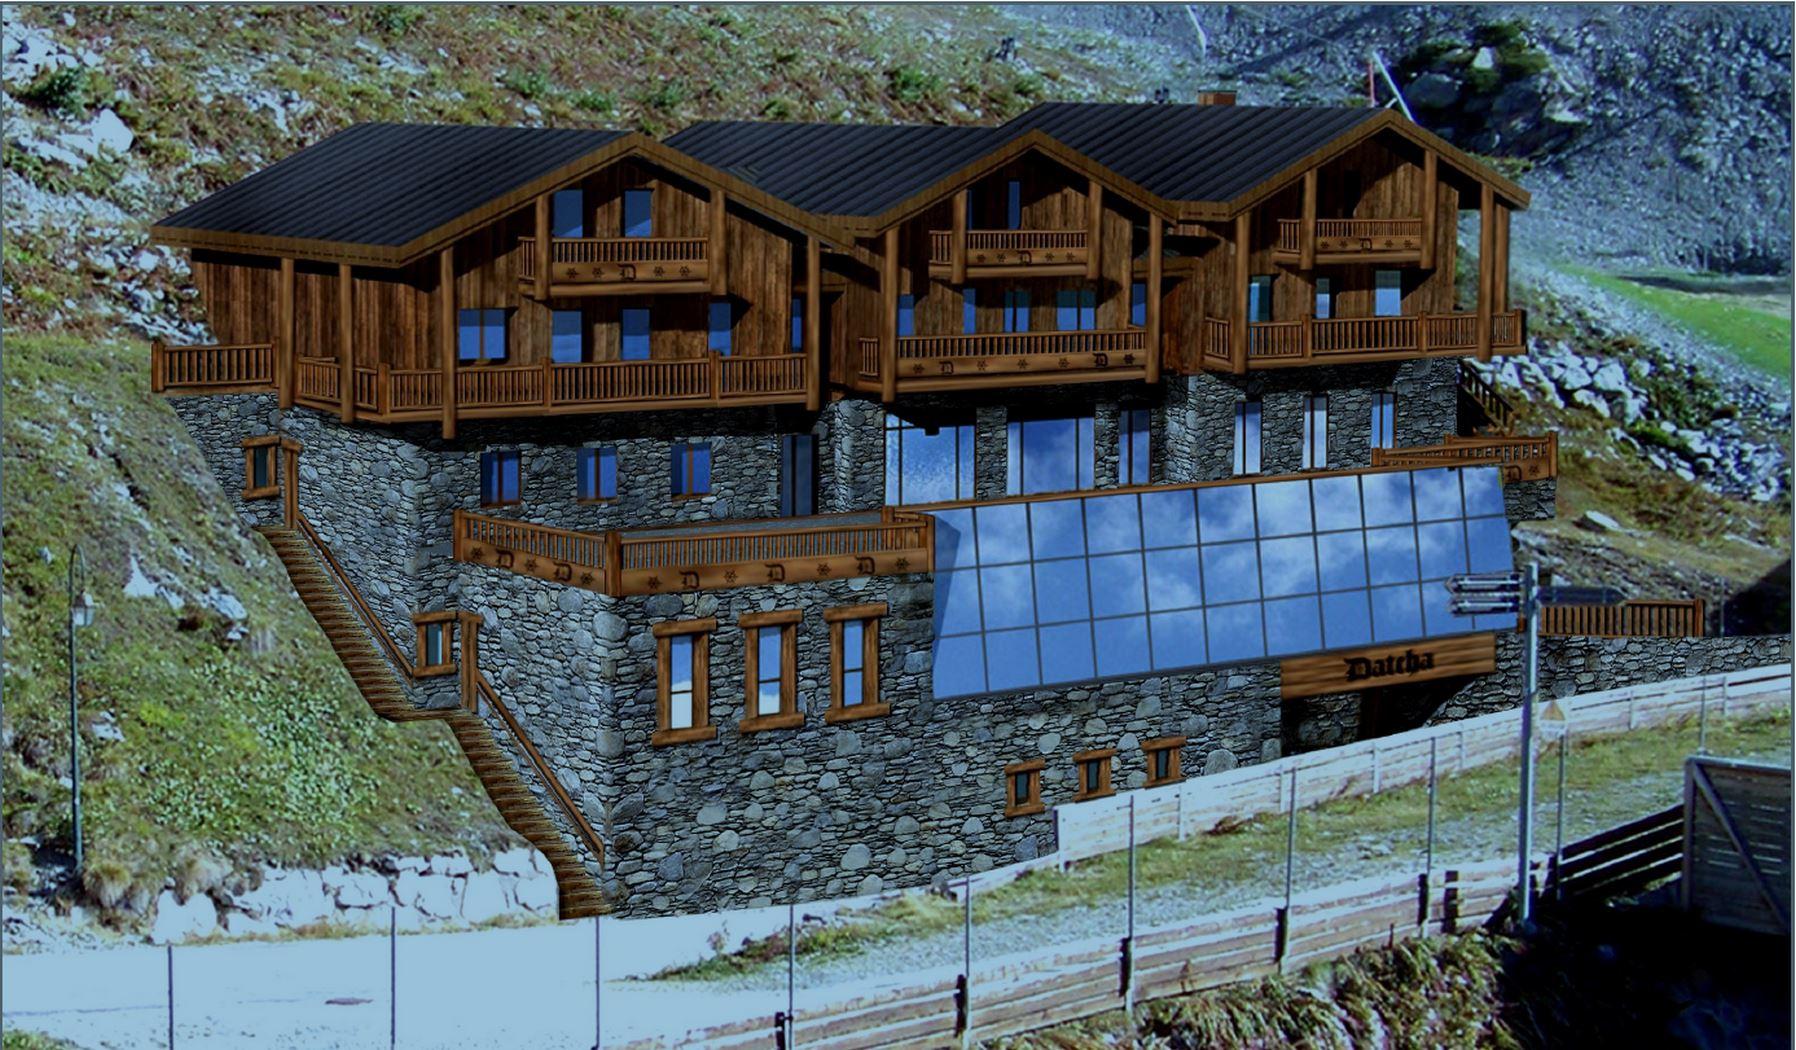 EXCEPTIONAL: LUXURY GUEST CHALET LA DATCHA - PRIVATE CHALET - 1200 m² - 15 persons